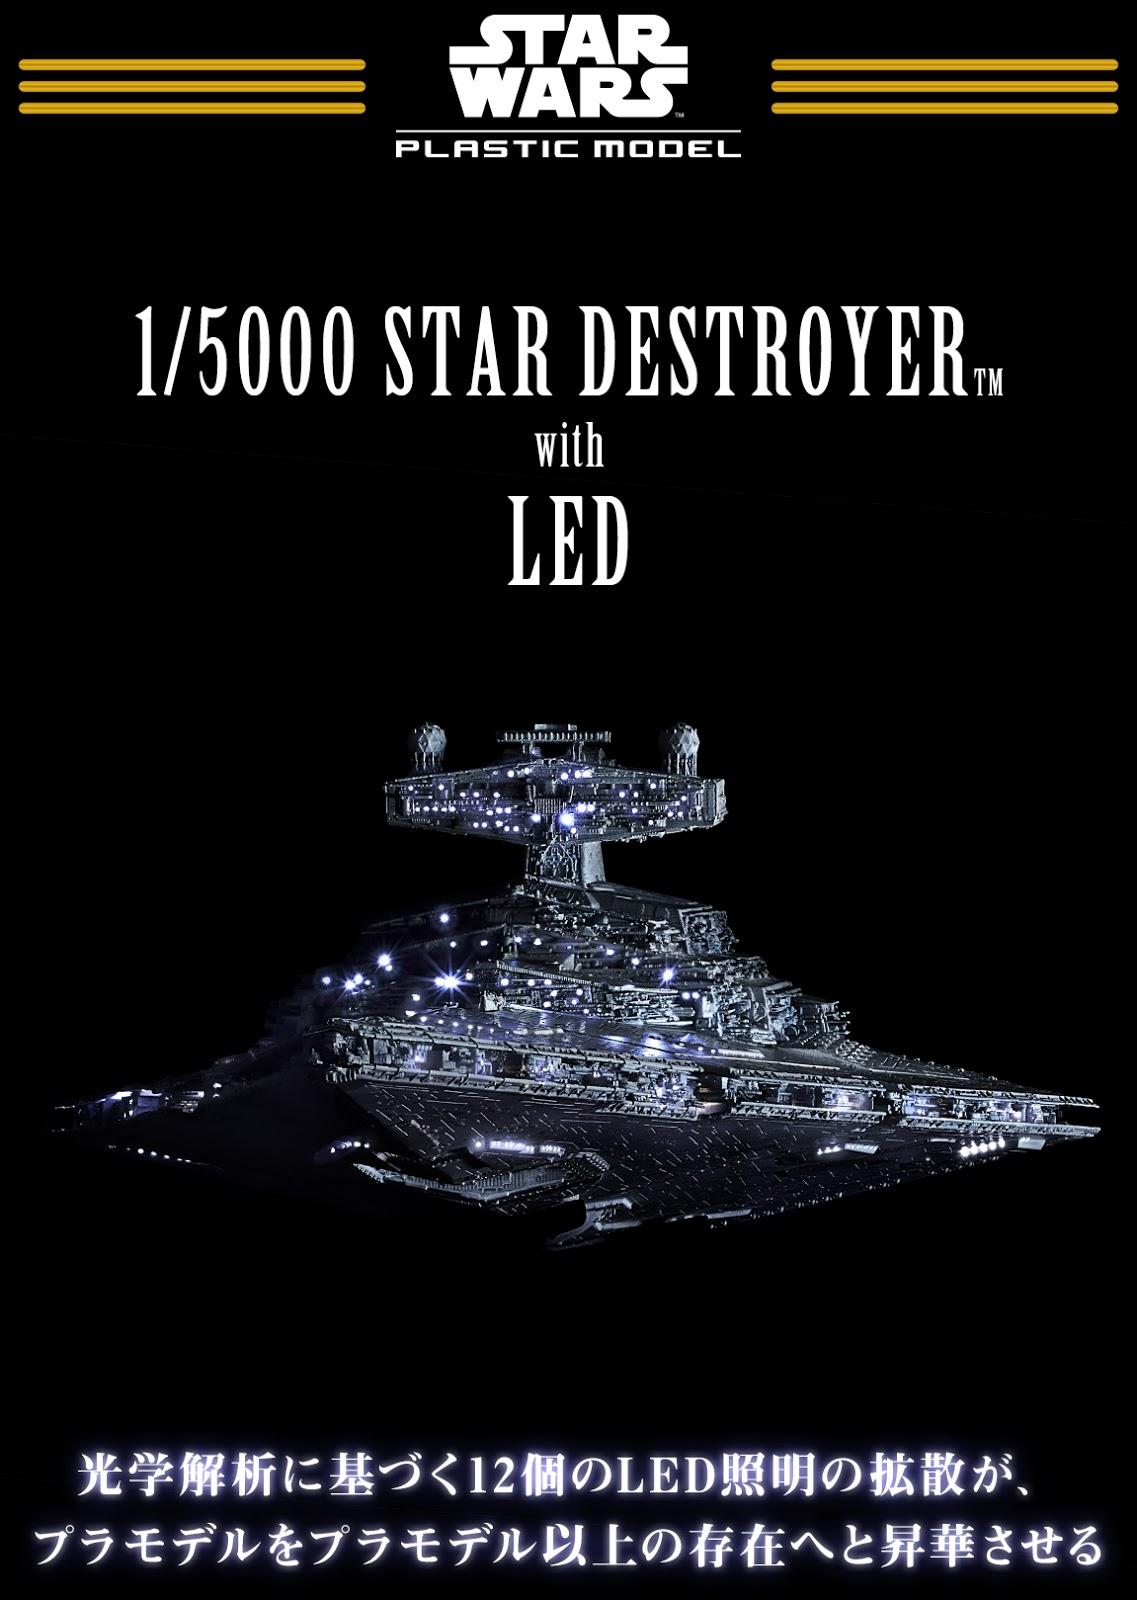 DeToyz Shop: Bandai Star Wars 1/5000 Star Destroyer kit revealed!